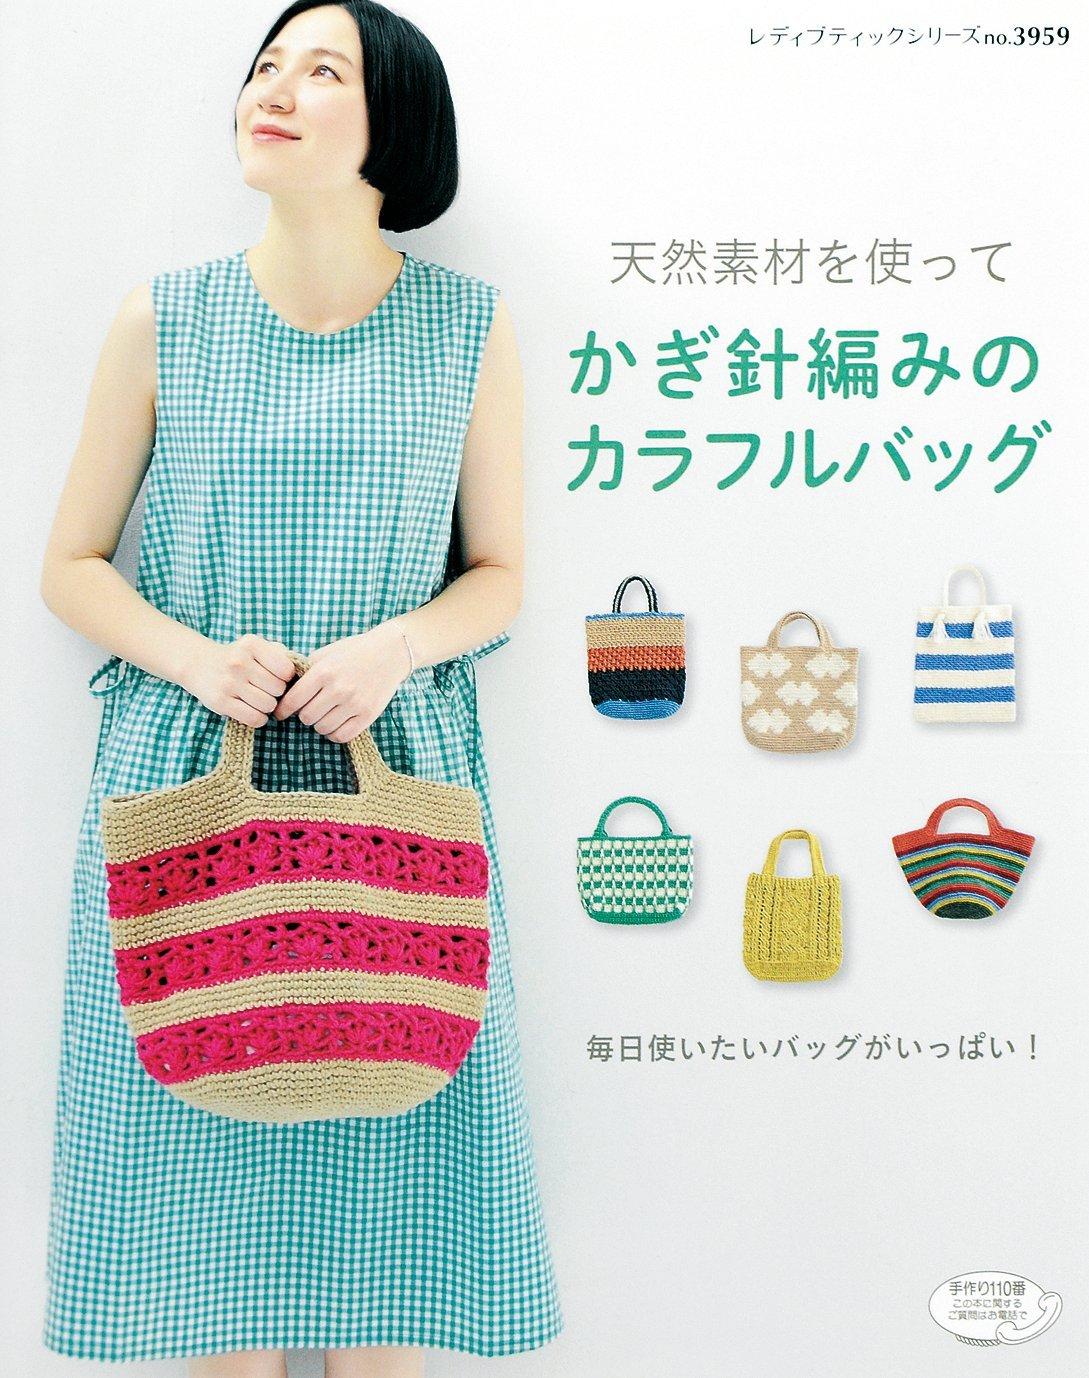 Colorful bag of Crochet